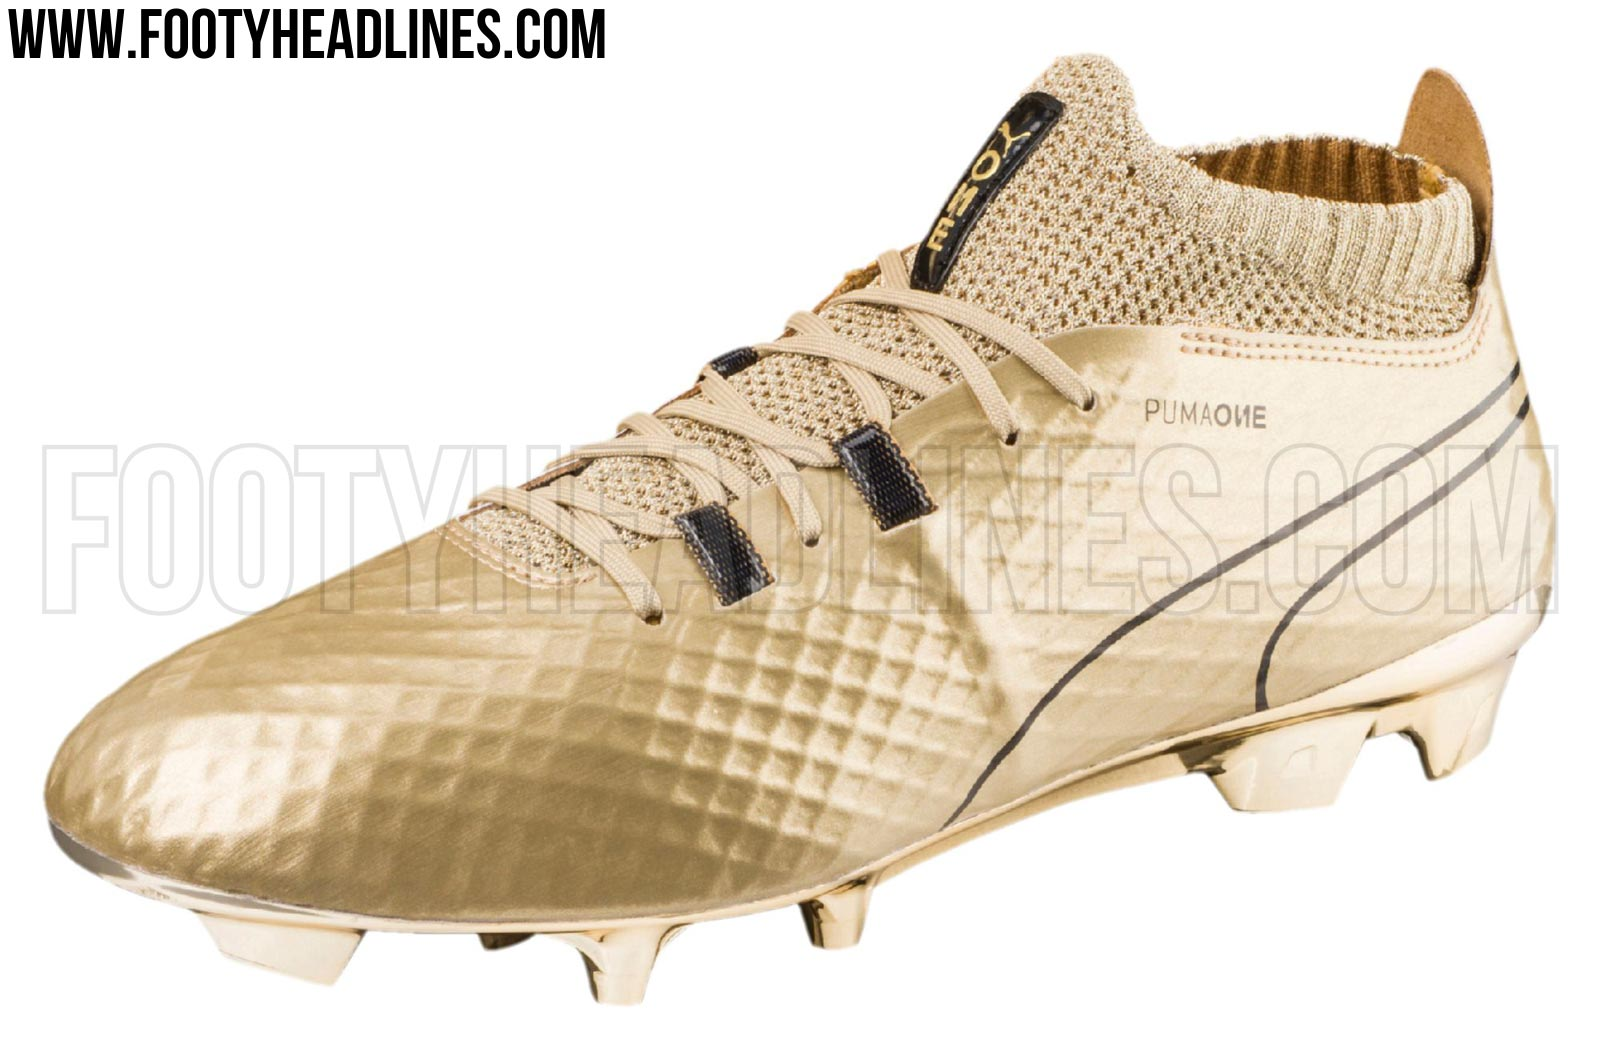 gold puma football boots